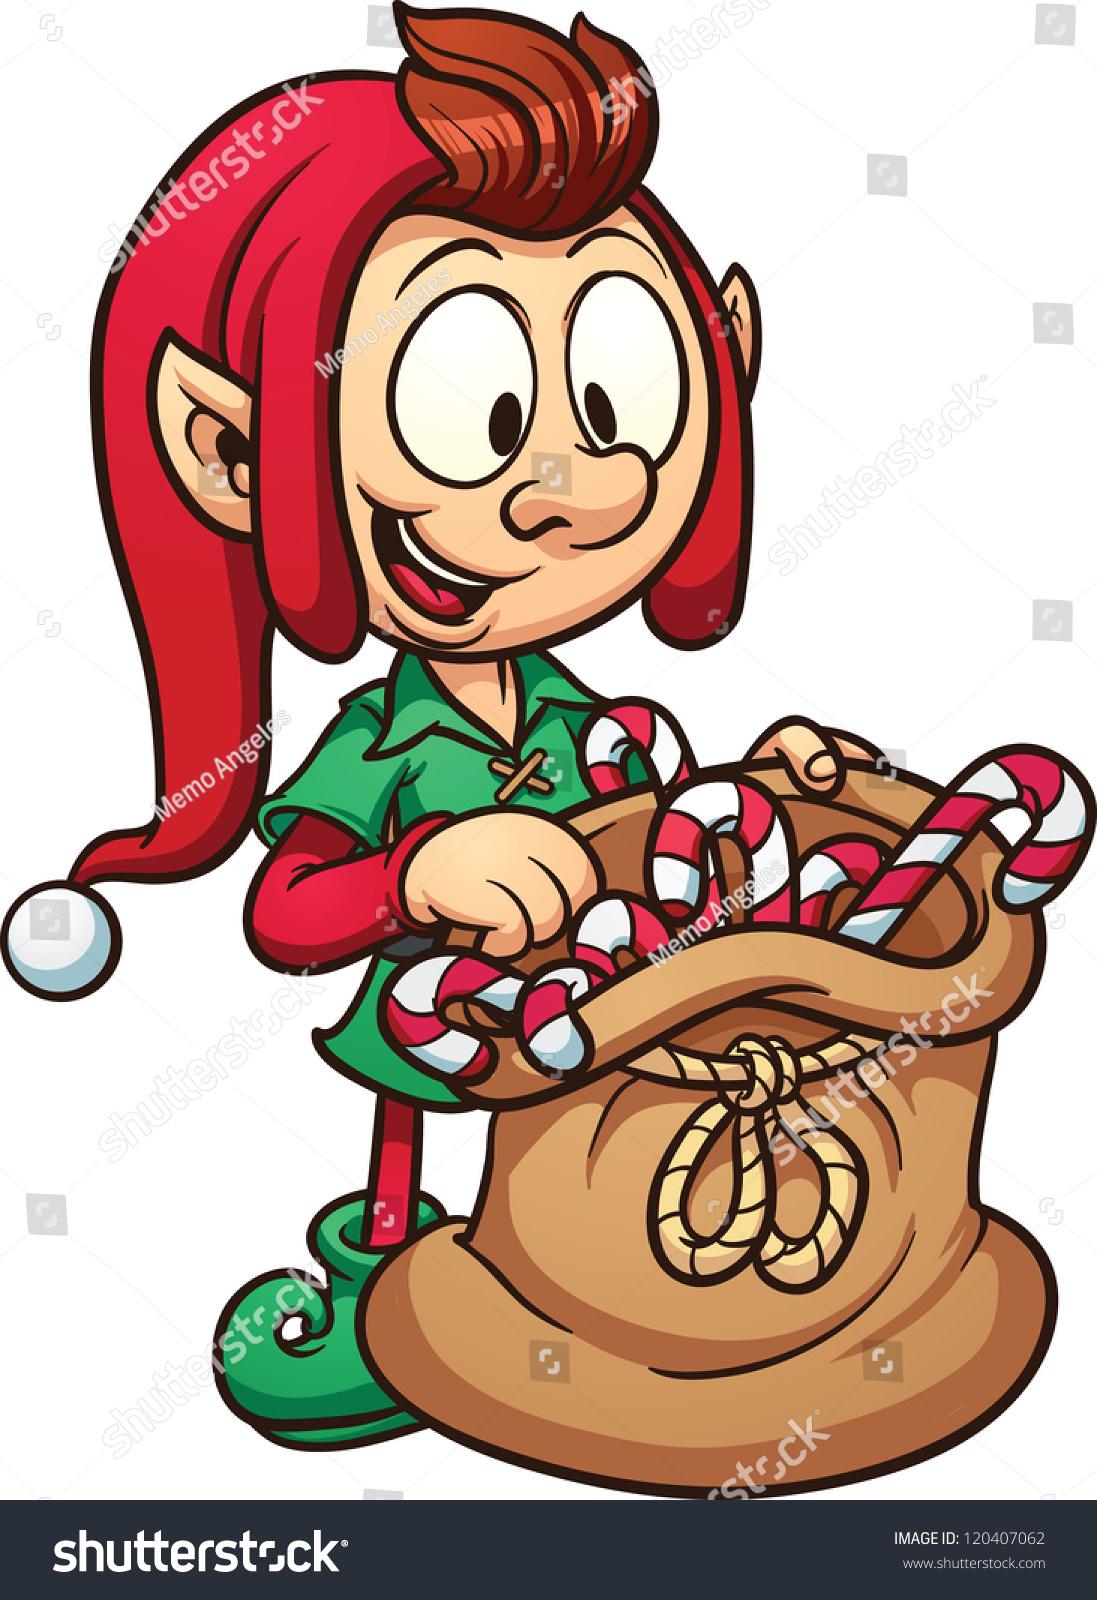 Cute Cartoon Christmas Elf Bag Candy Stock Vector ...